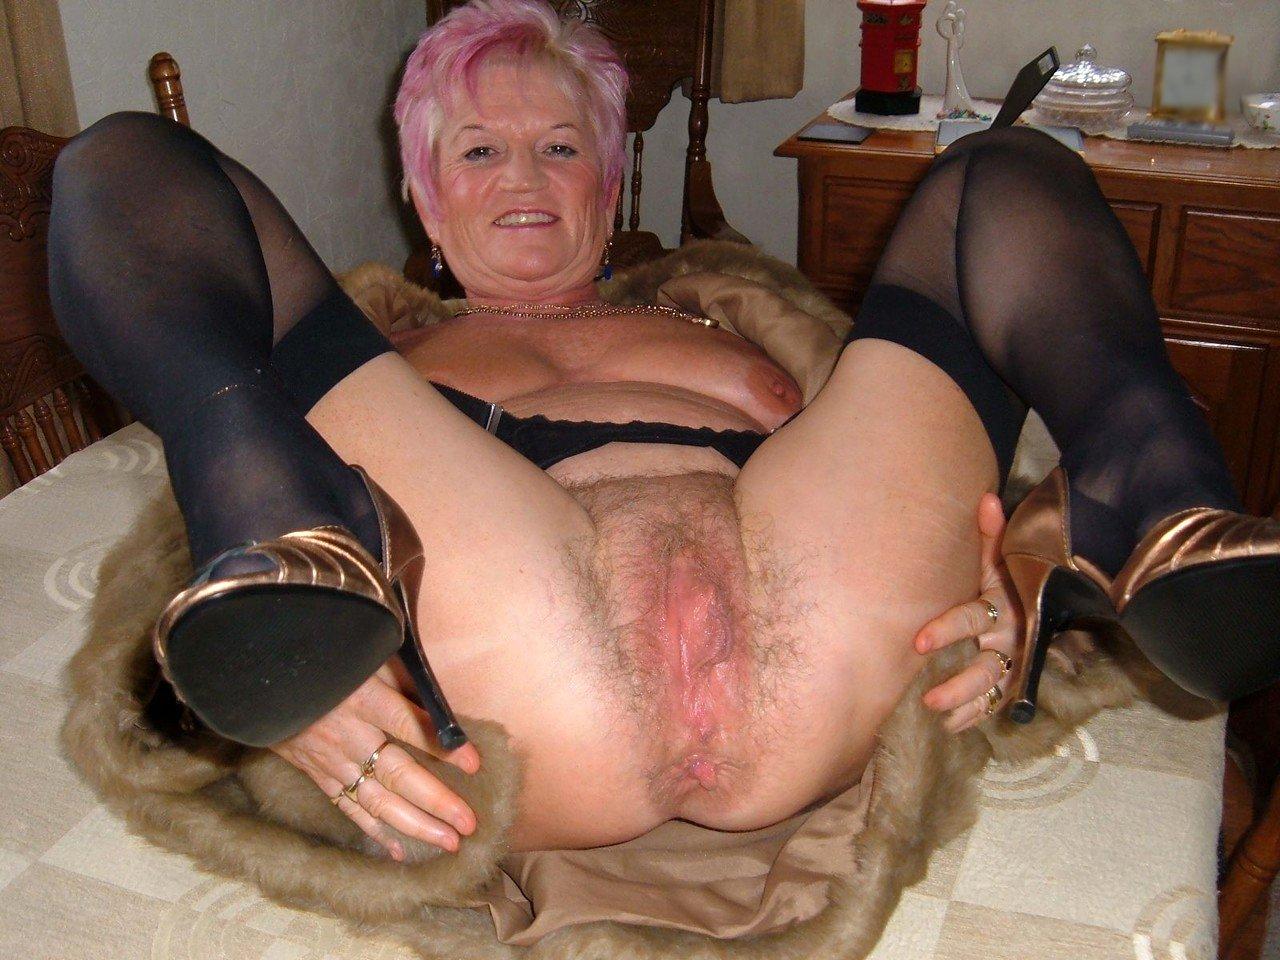 Bbw Granny White Panties Cameltoe Masturbate Free Sex Pics